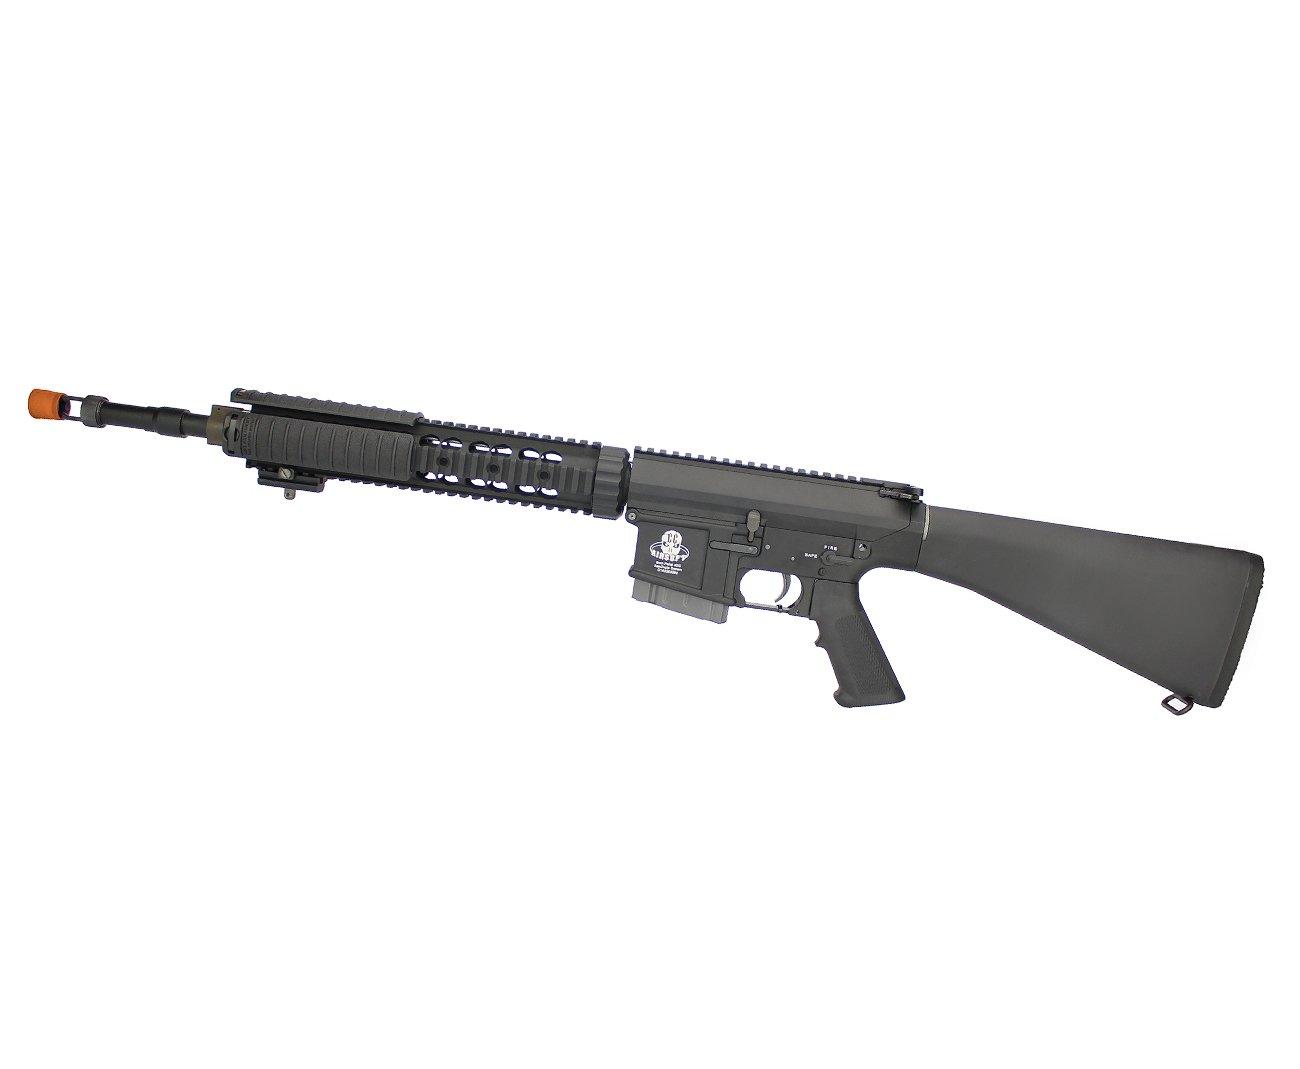 Rifle De Airsoft Gr25 S.p.r Full Metal - Cal 6.0mm - G&g Premium